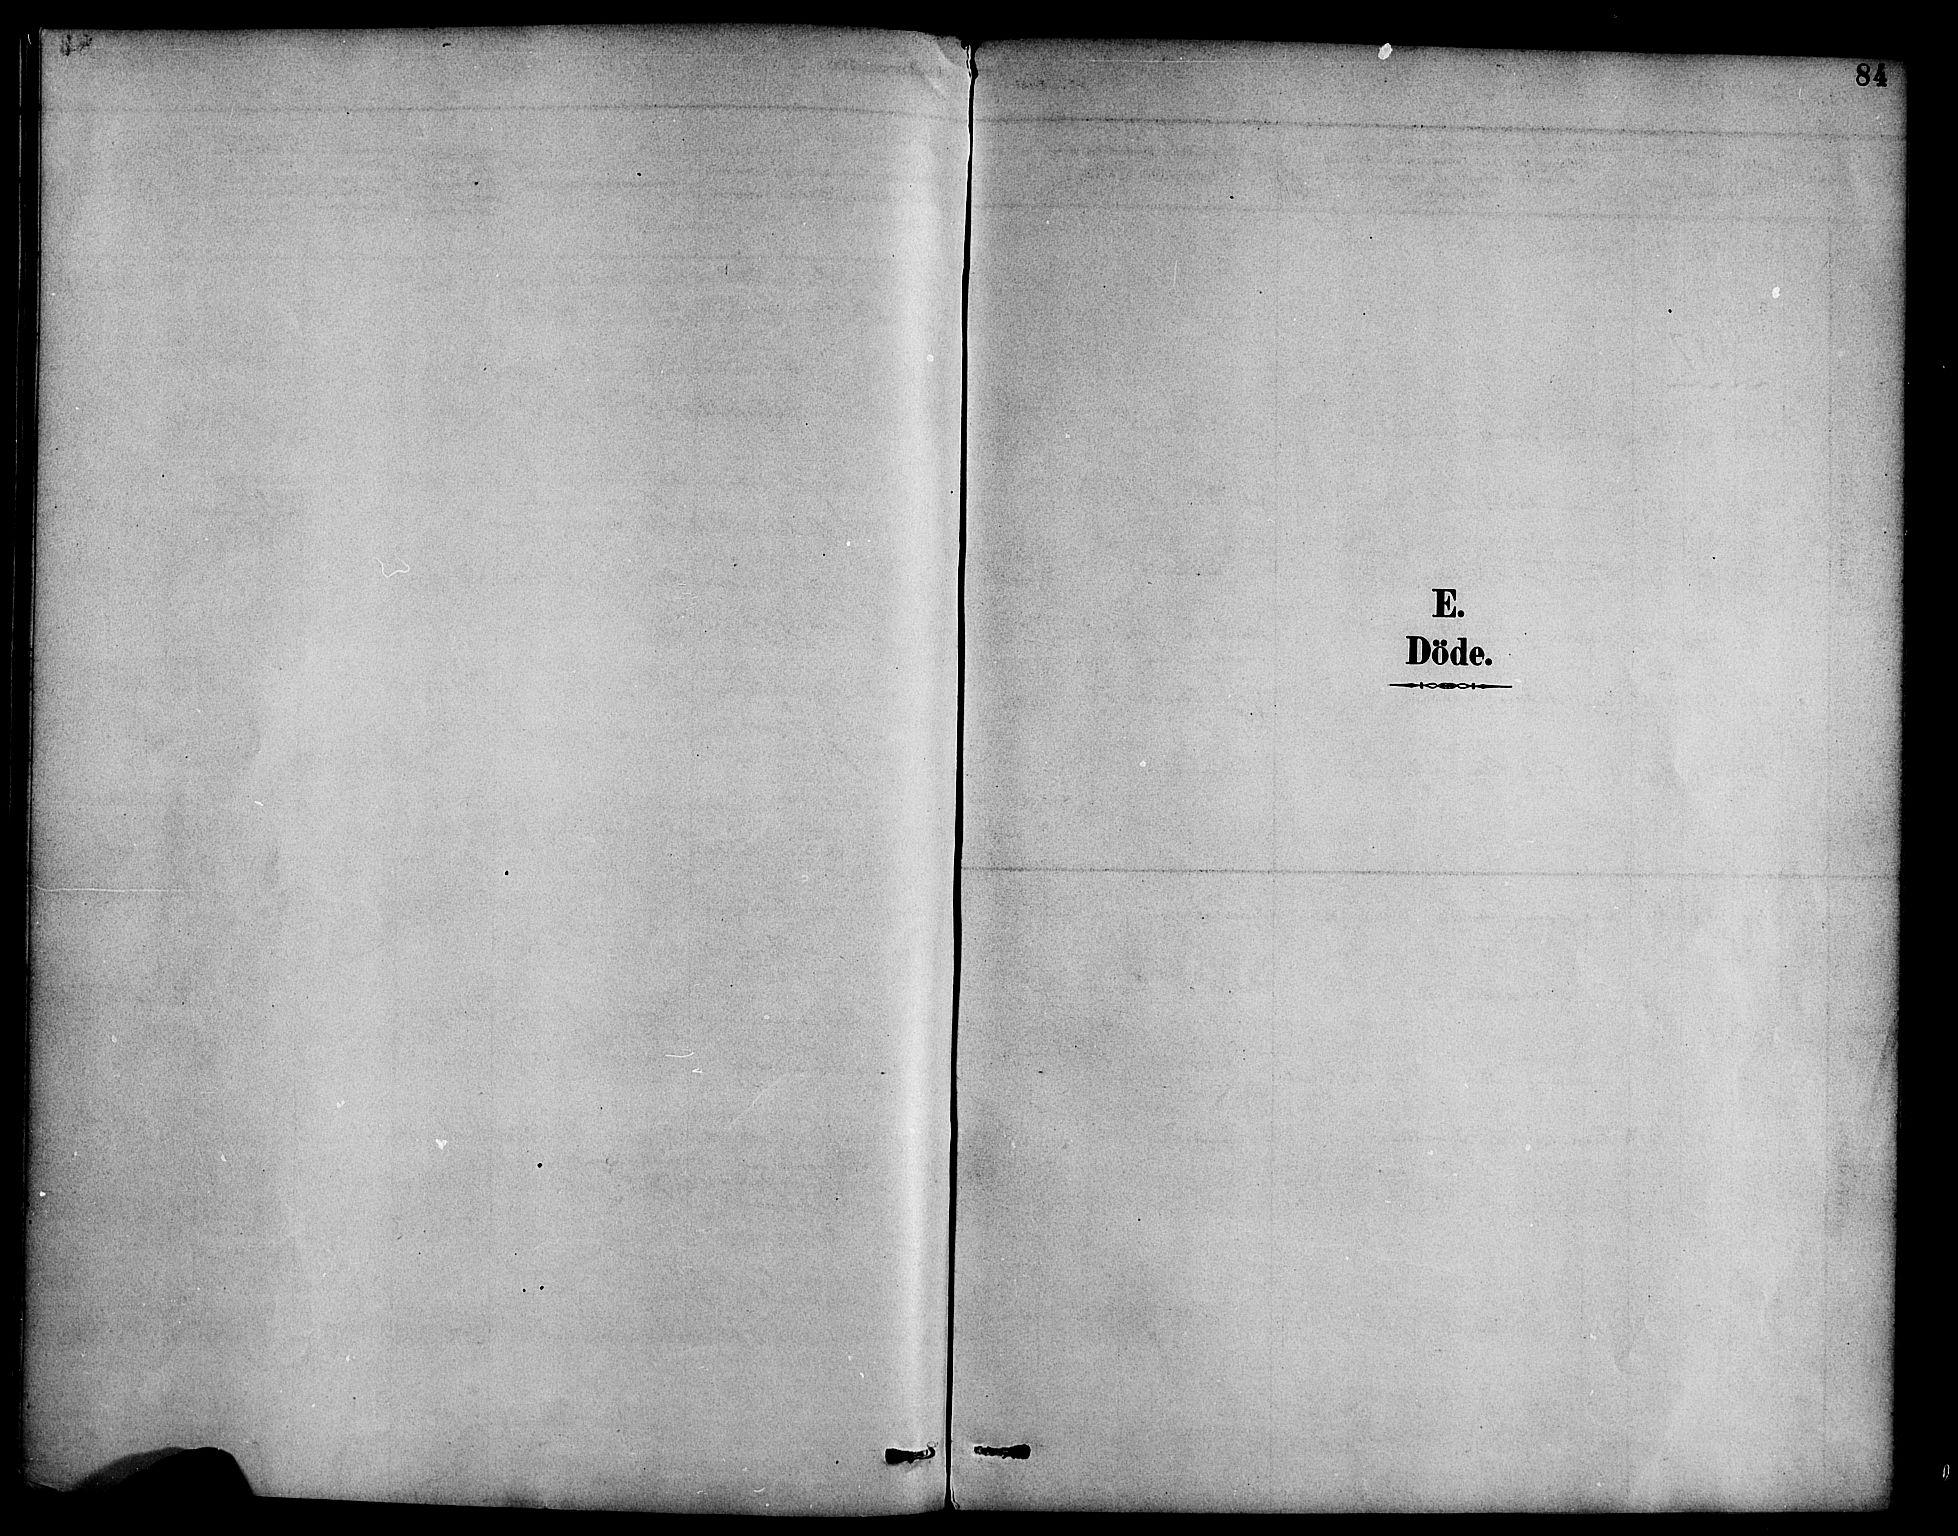 SAB, Hyllestad Sokneprestembete, Ministerialbok nr. B 1, 1886-1904, s. 84